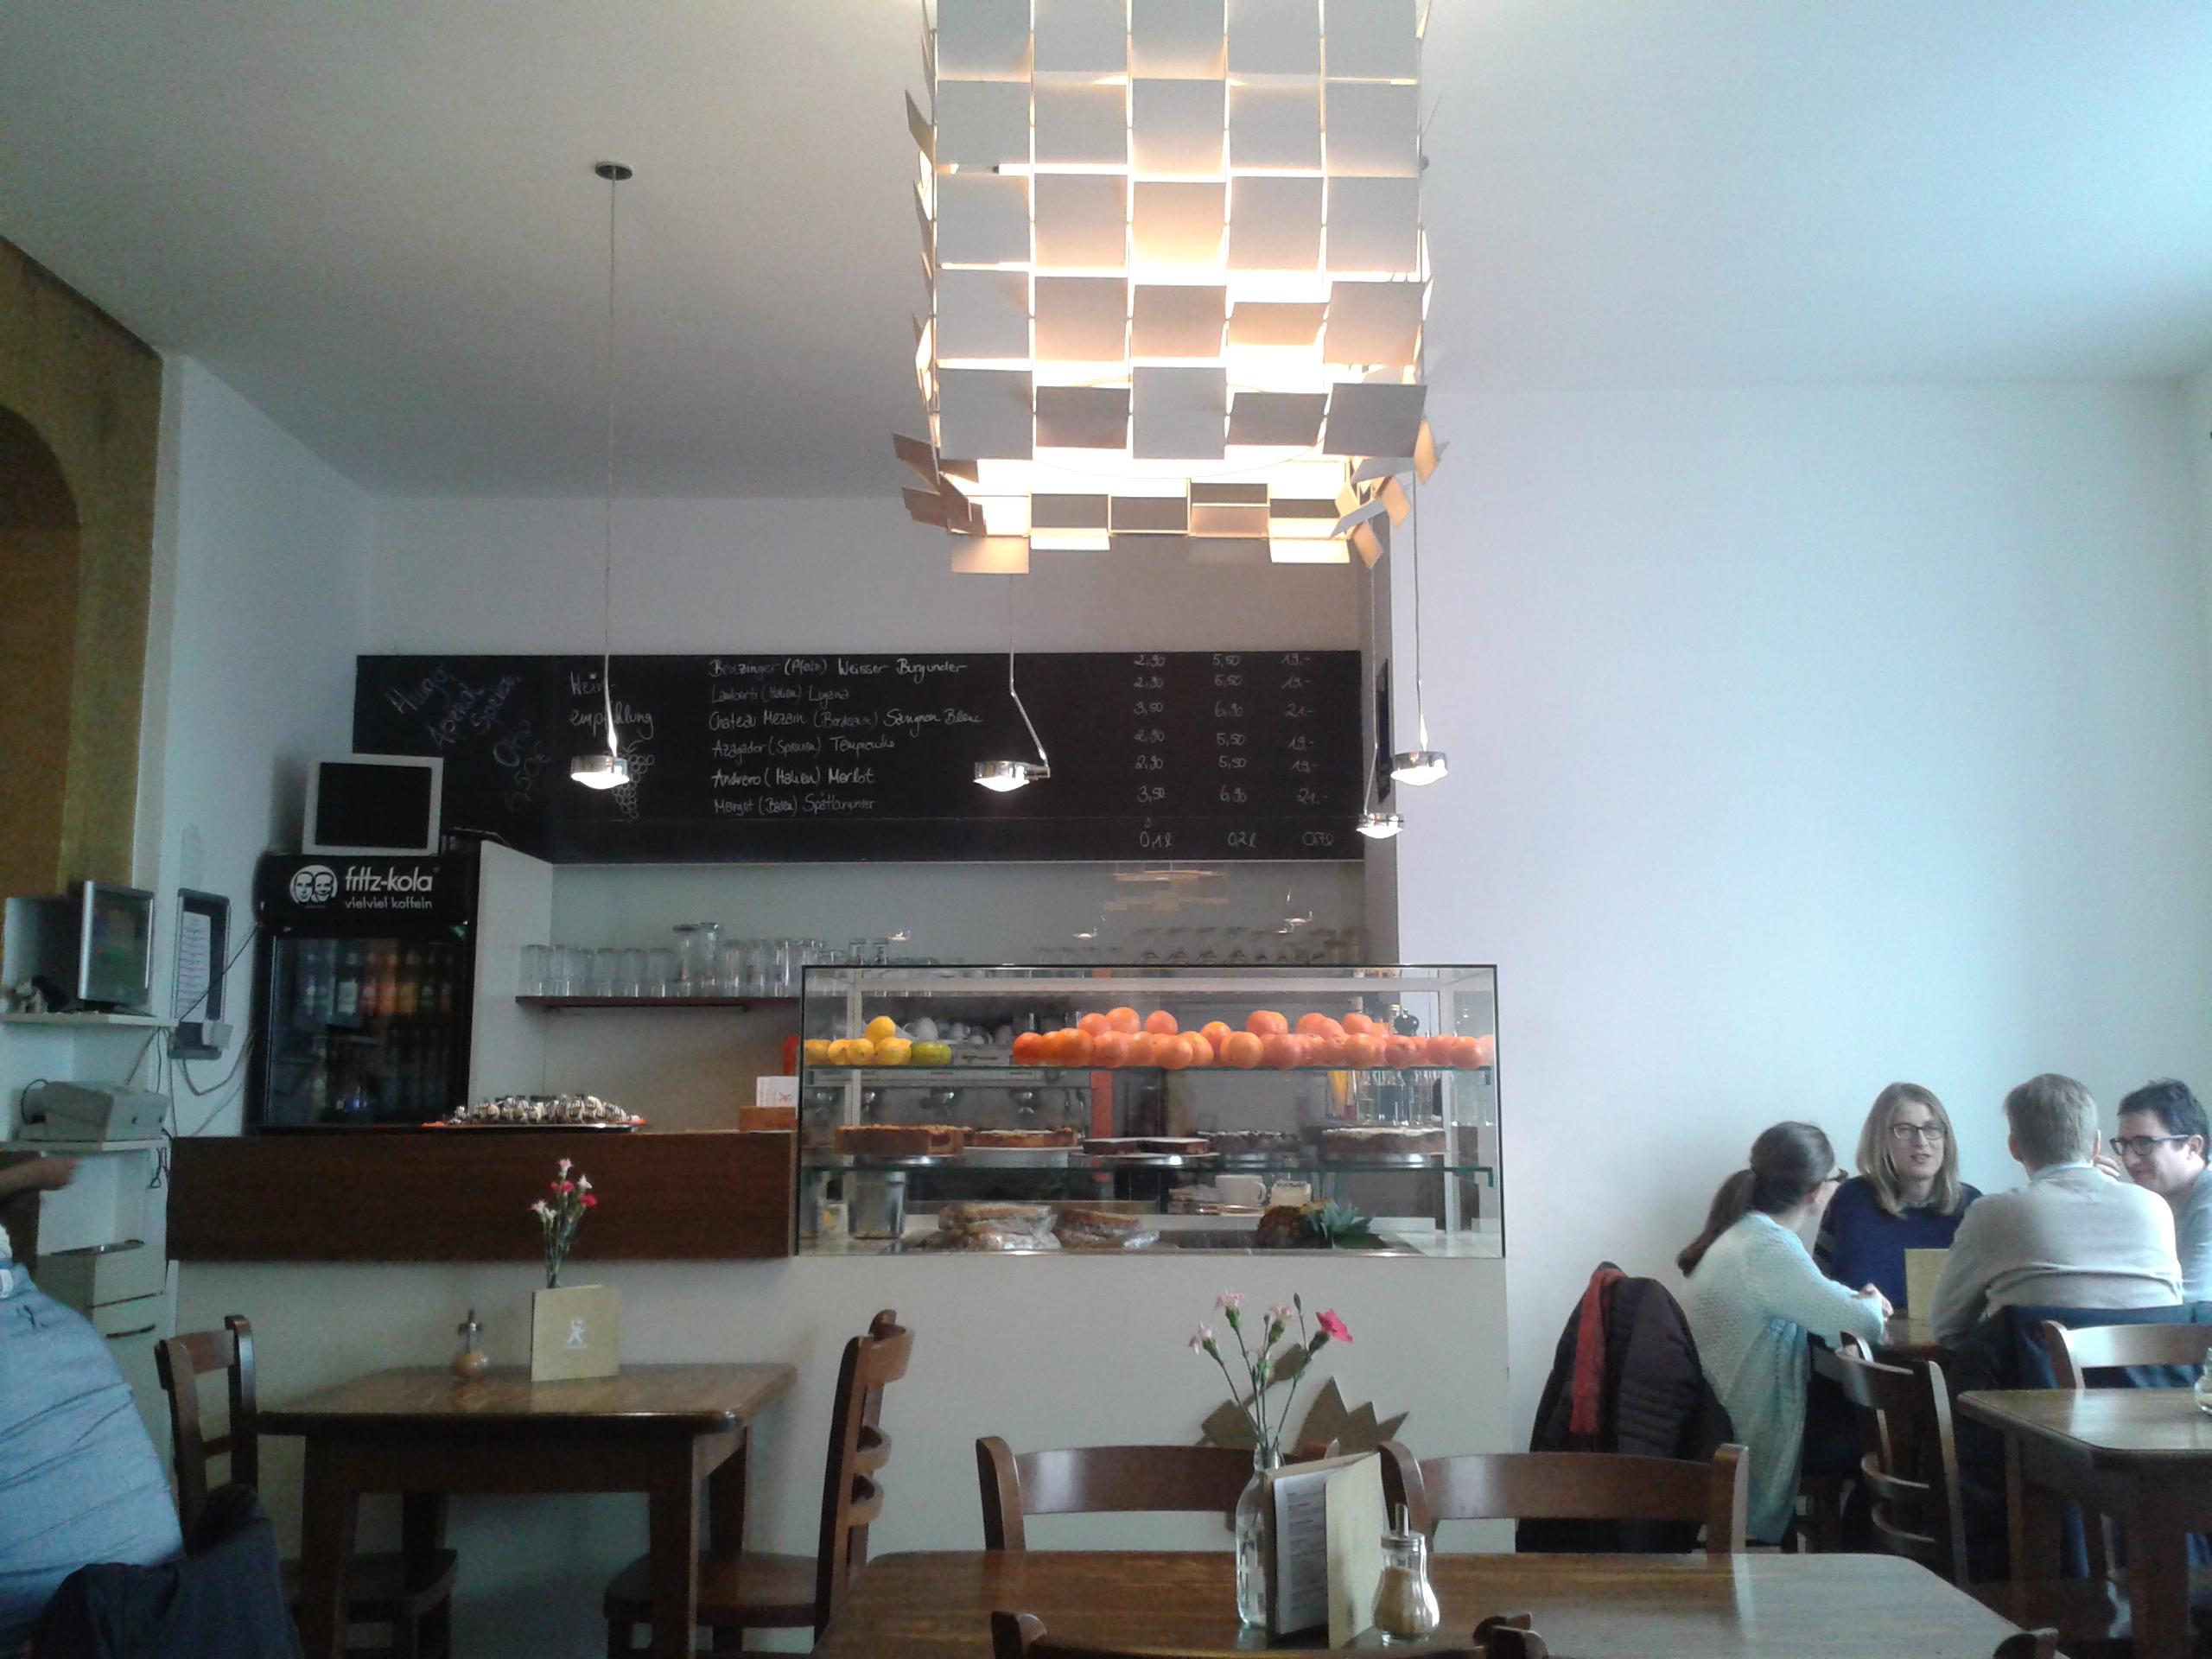 Café & Restaurant Kaiser Otto